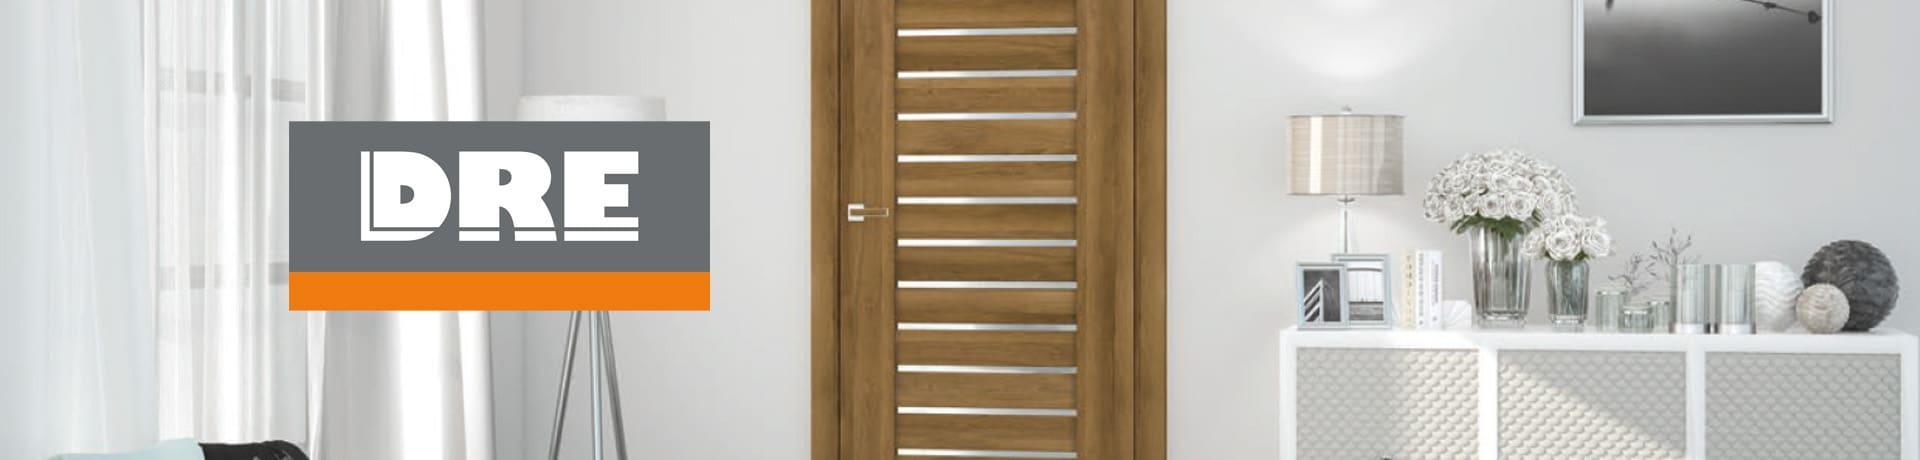 Drzwi DRE baner